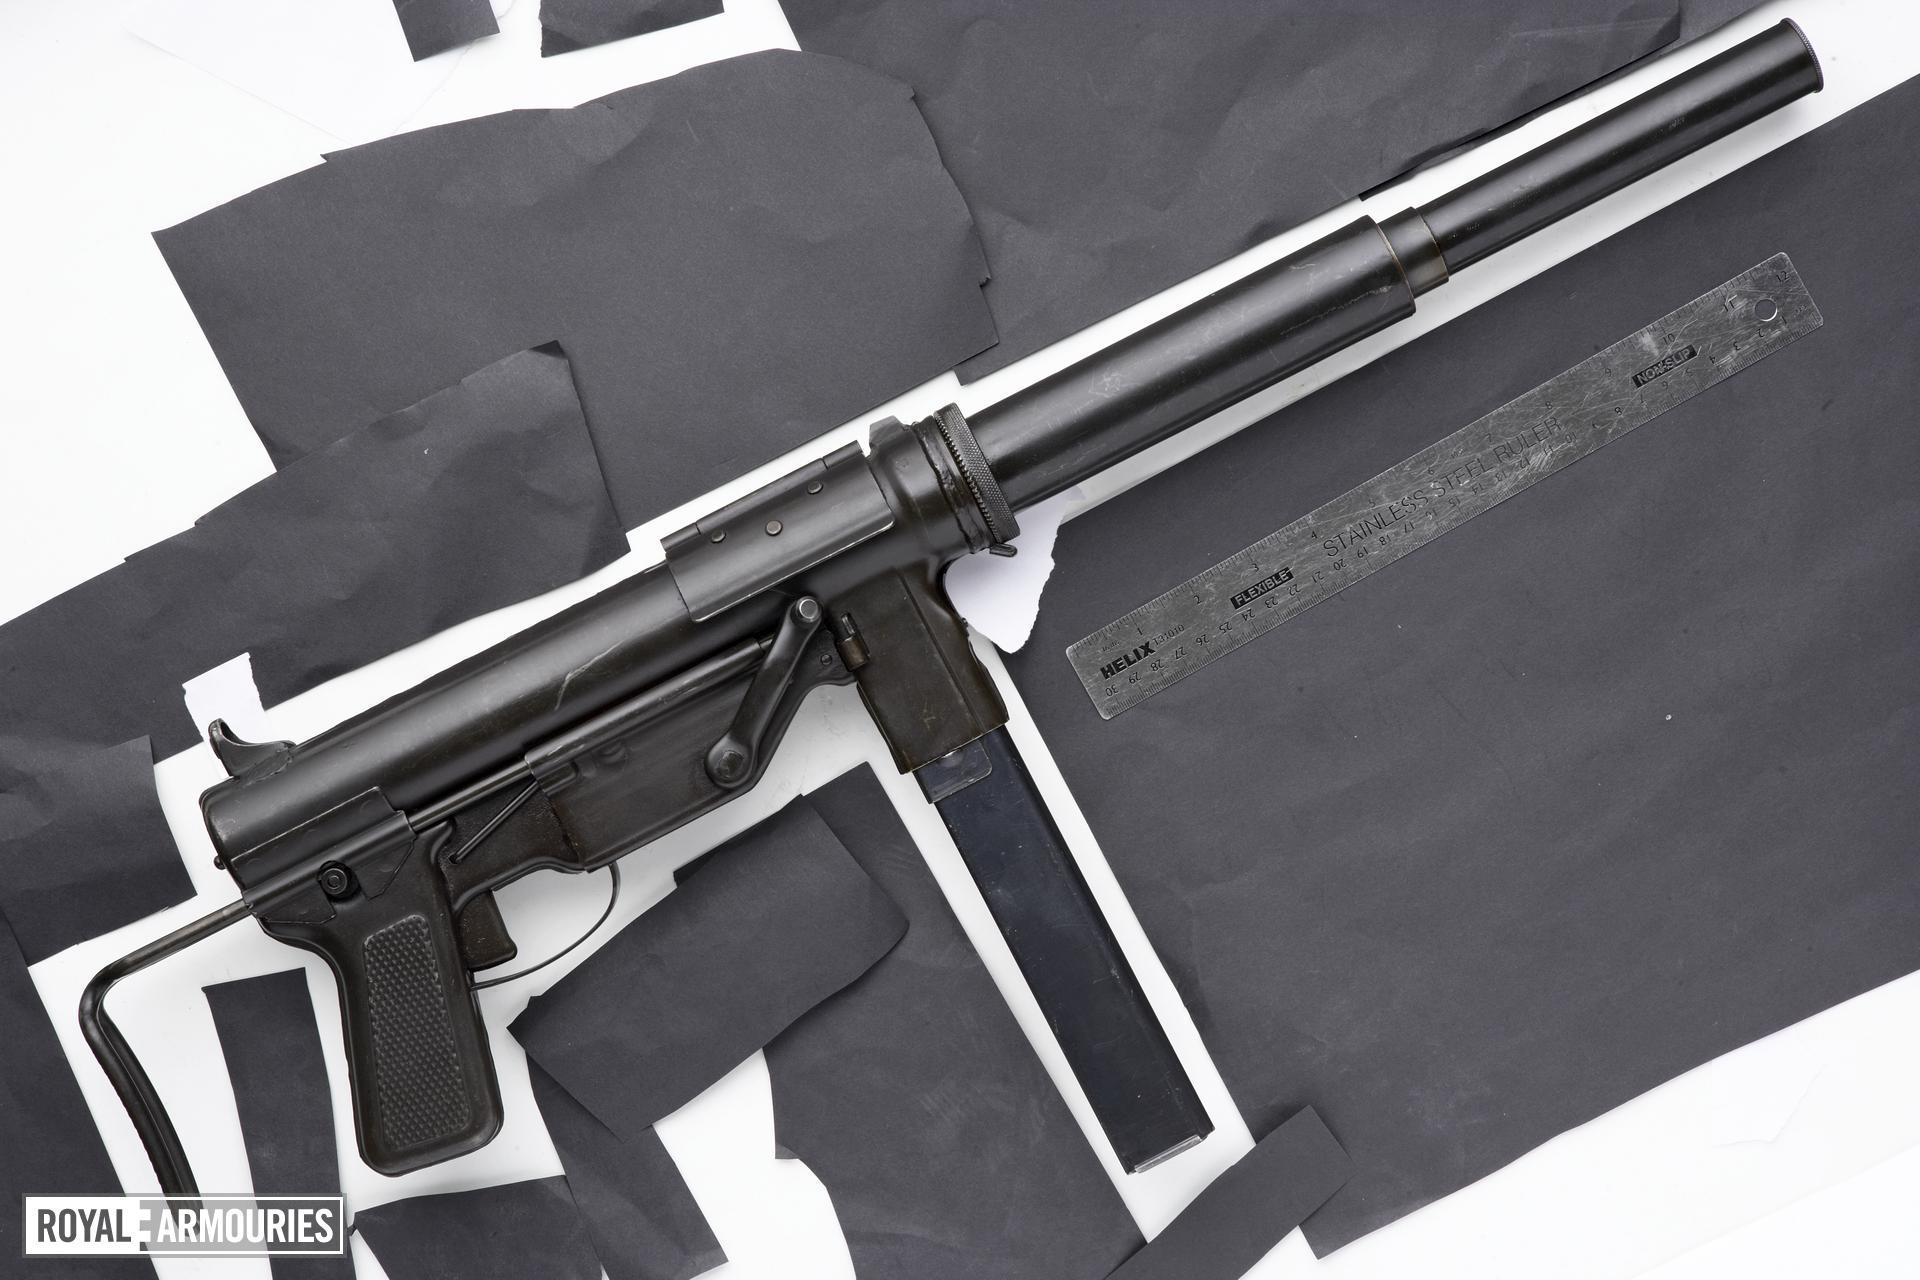 Centrefire automatic silenced submachine gun - M3 (Suppressed)